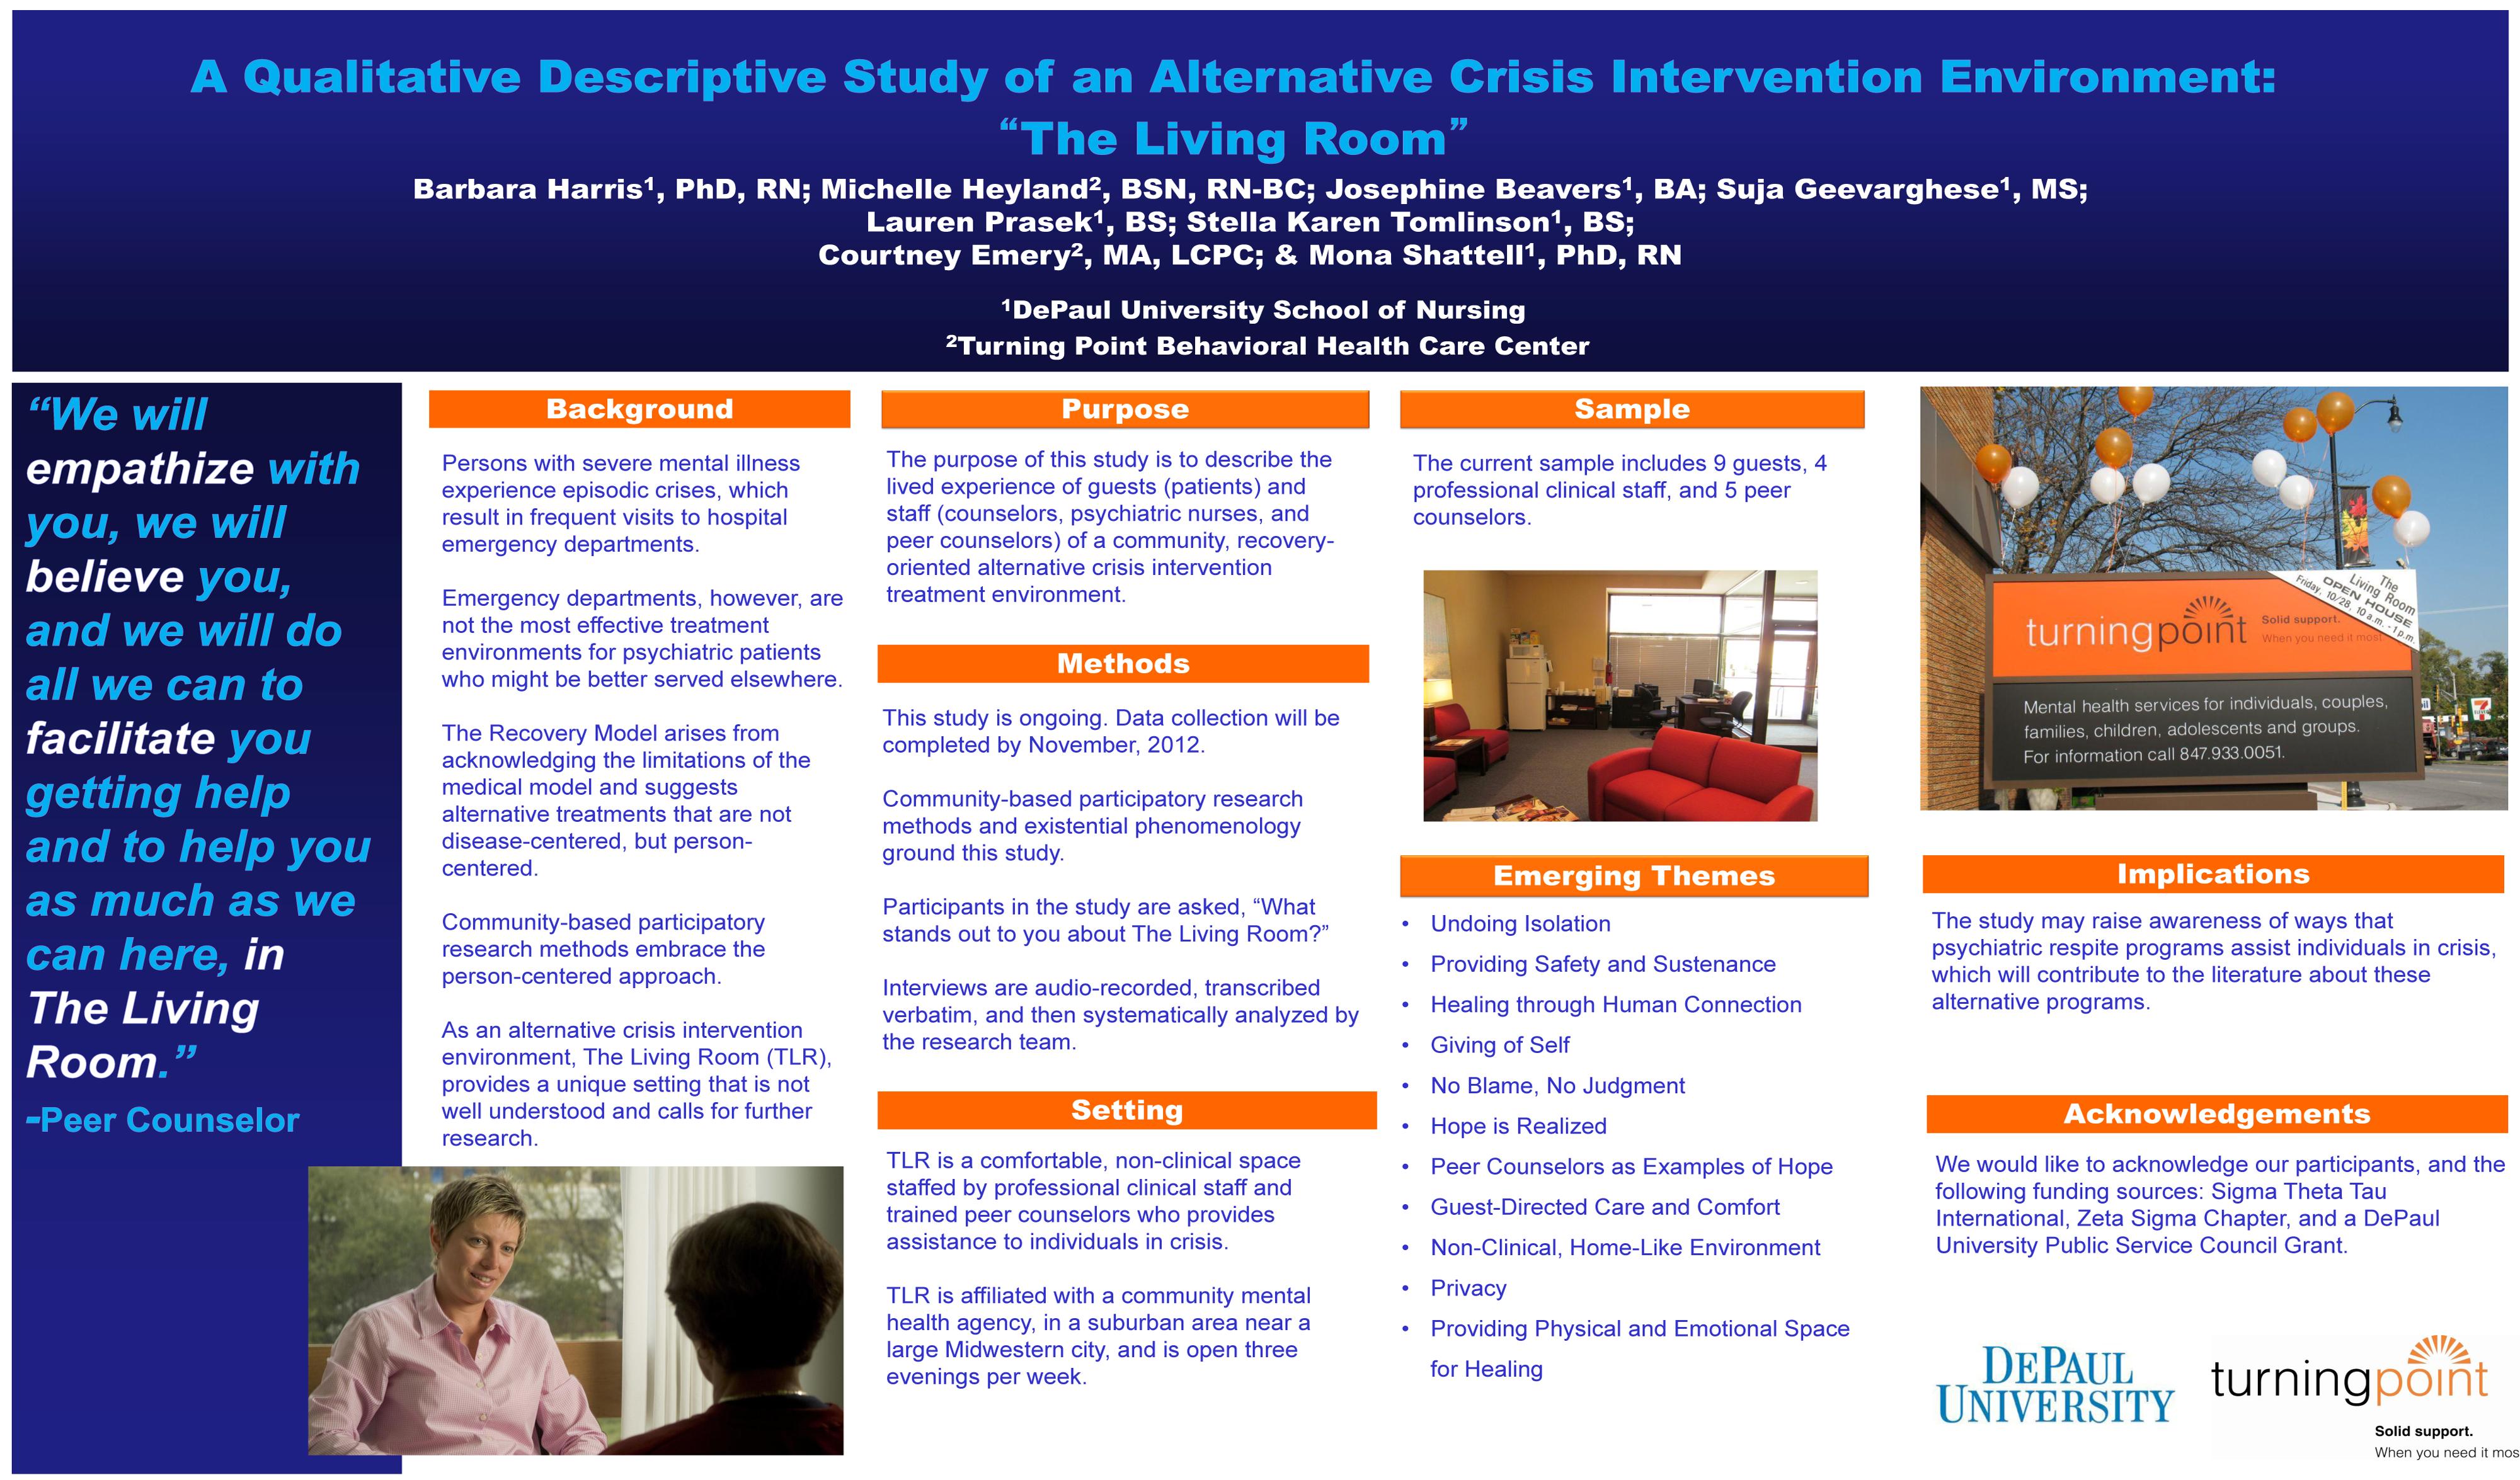 Qualitative poster design - A Qualitative Descriptive Study Of An Alternative Crisis Intervention Treatment Environment The Living Room